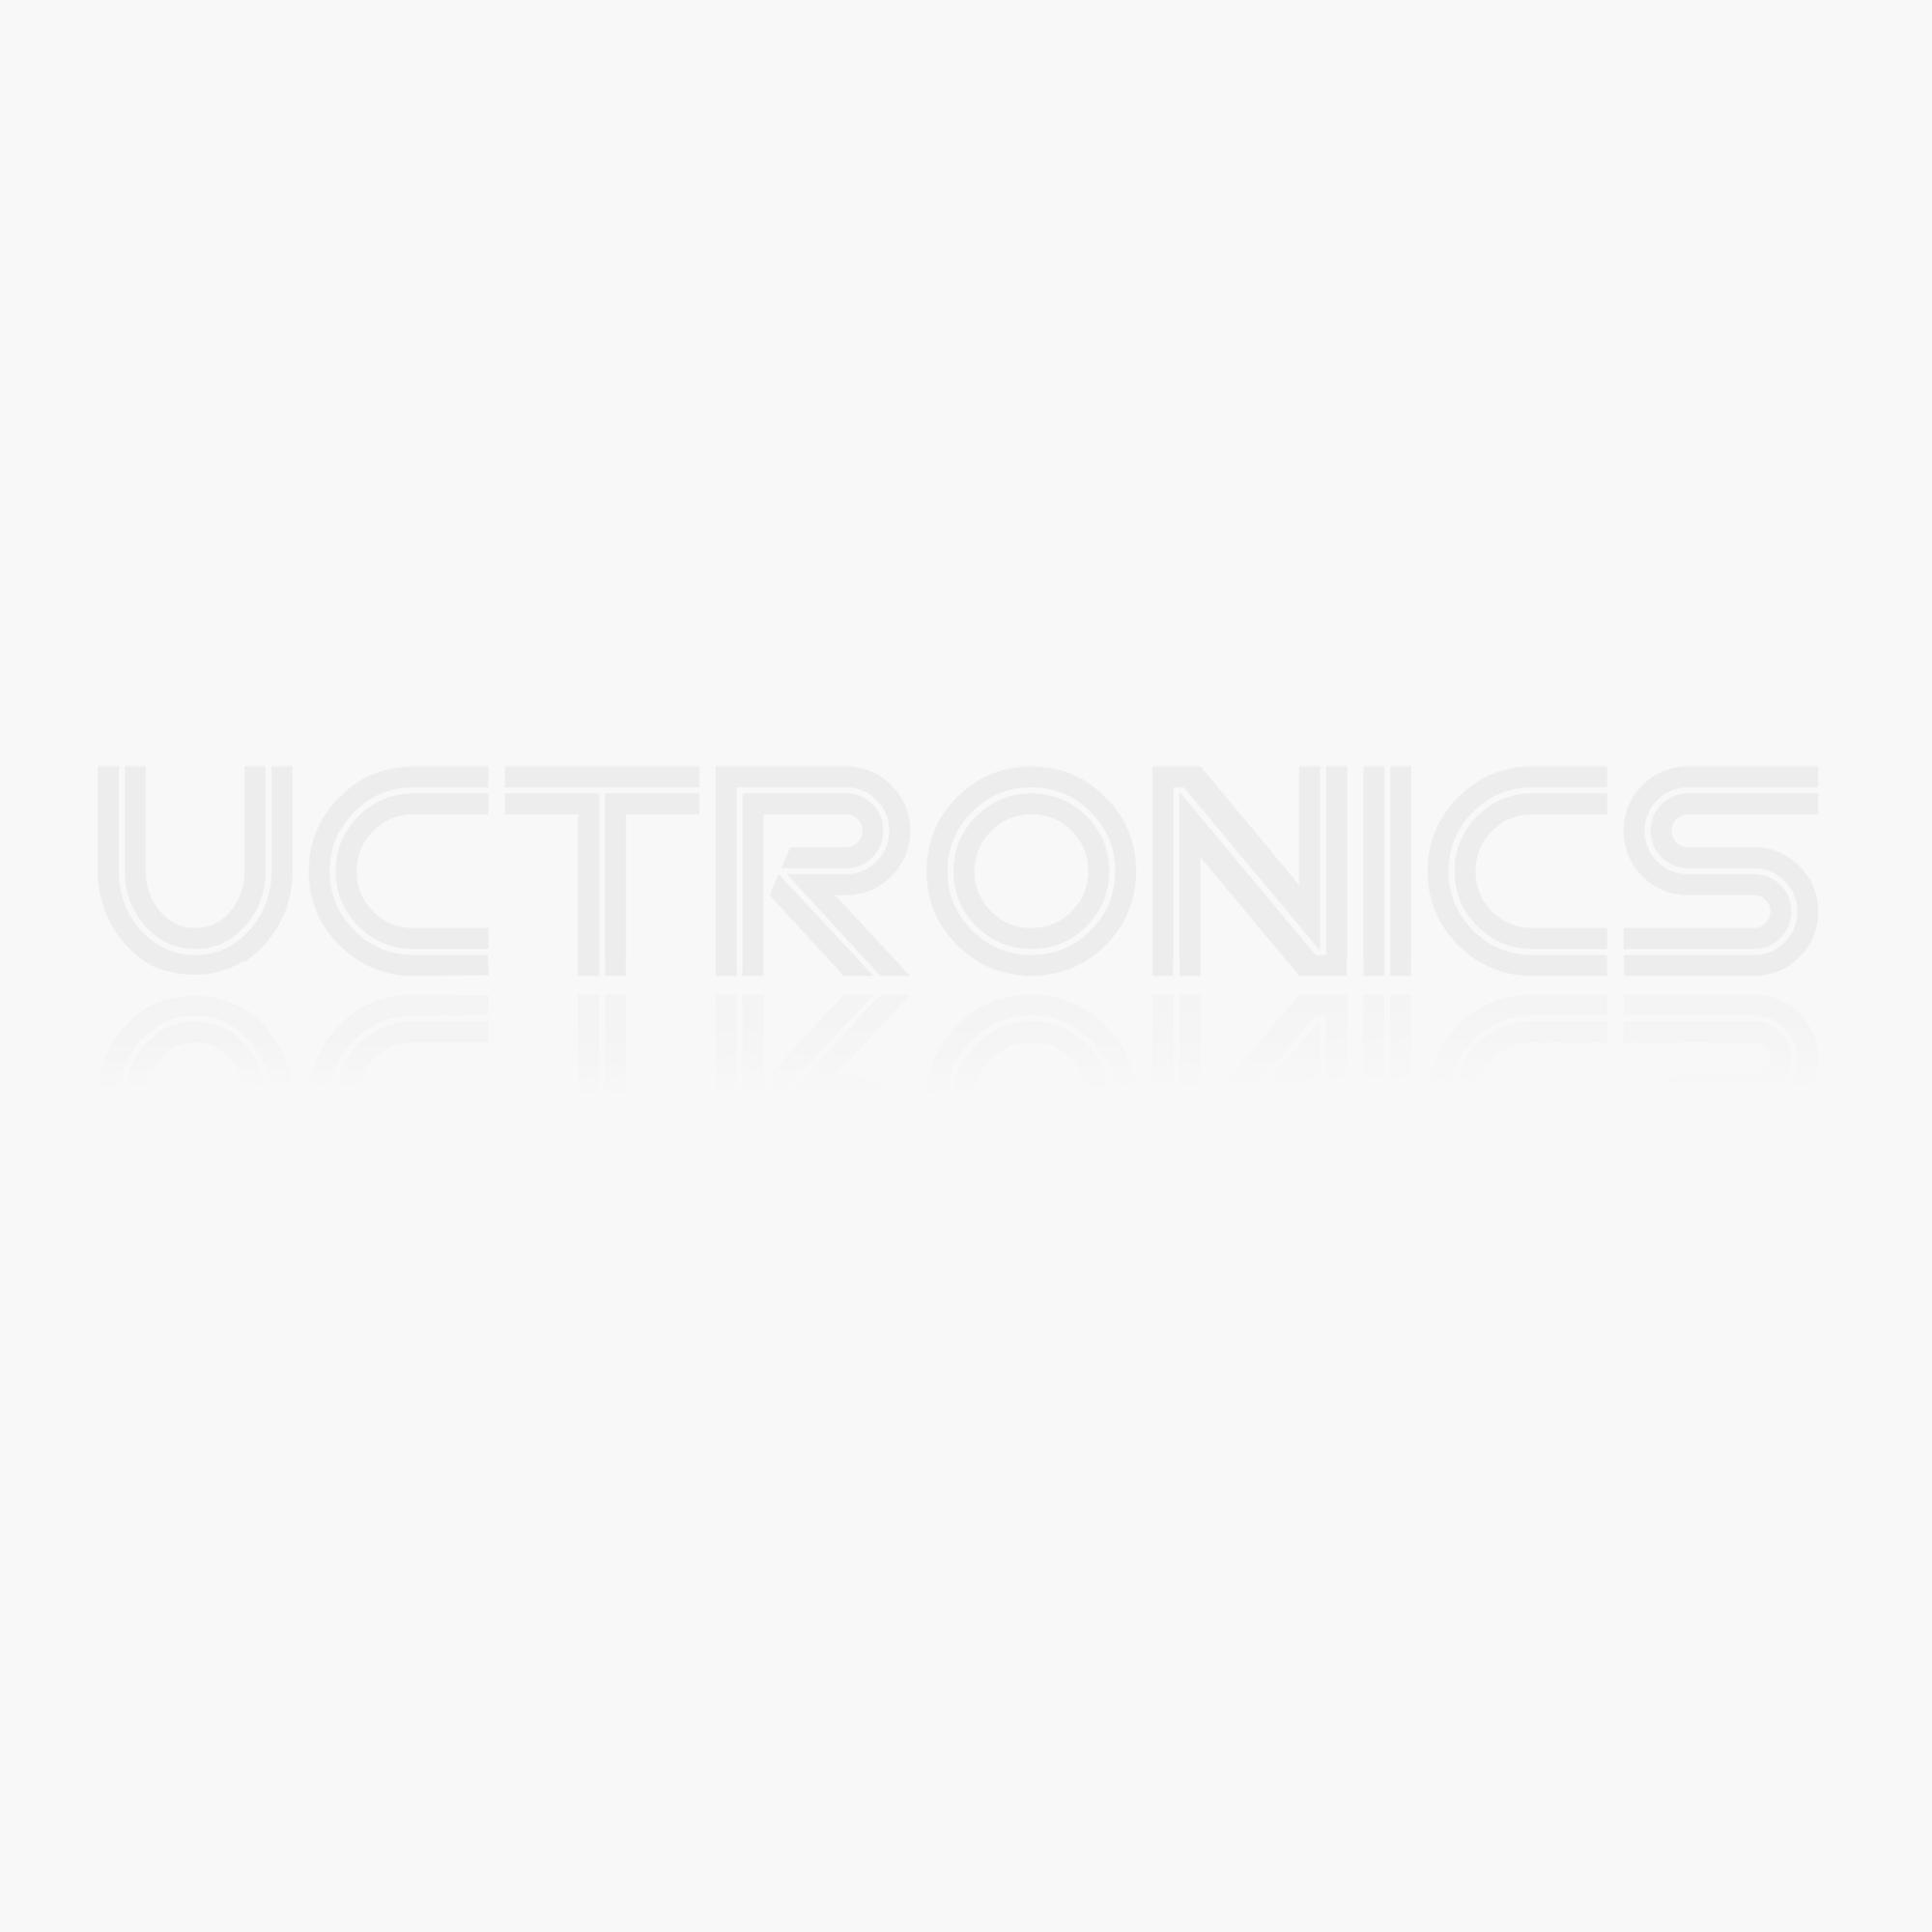 MAG3110 3 Axis Digital Magnetometer Sensor Module for Arduino